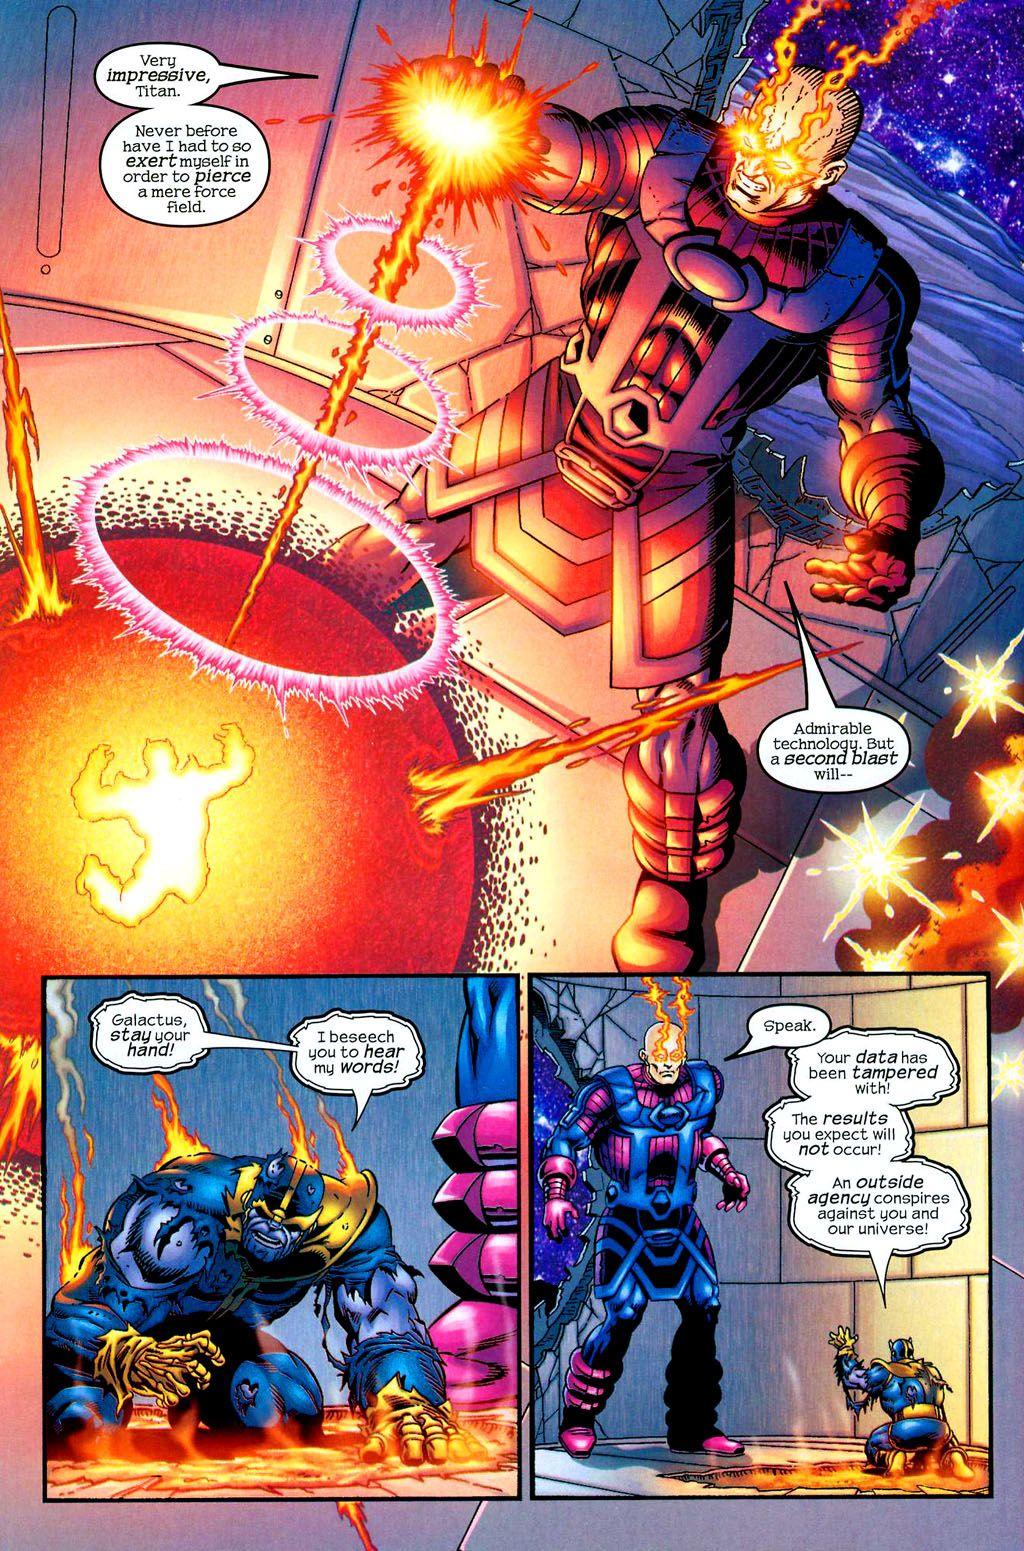 Galactus Vs Thanos - Page 2 - Marvel Heroes 2015   Marvel ...